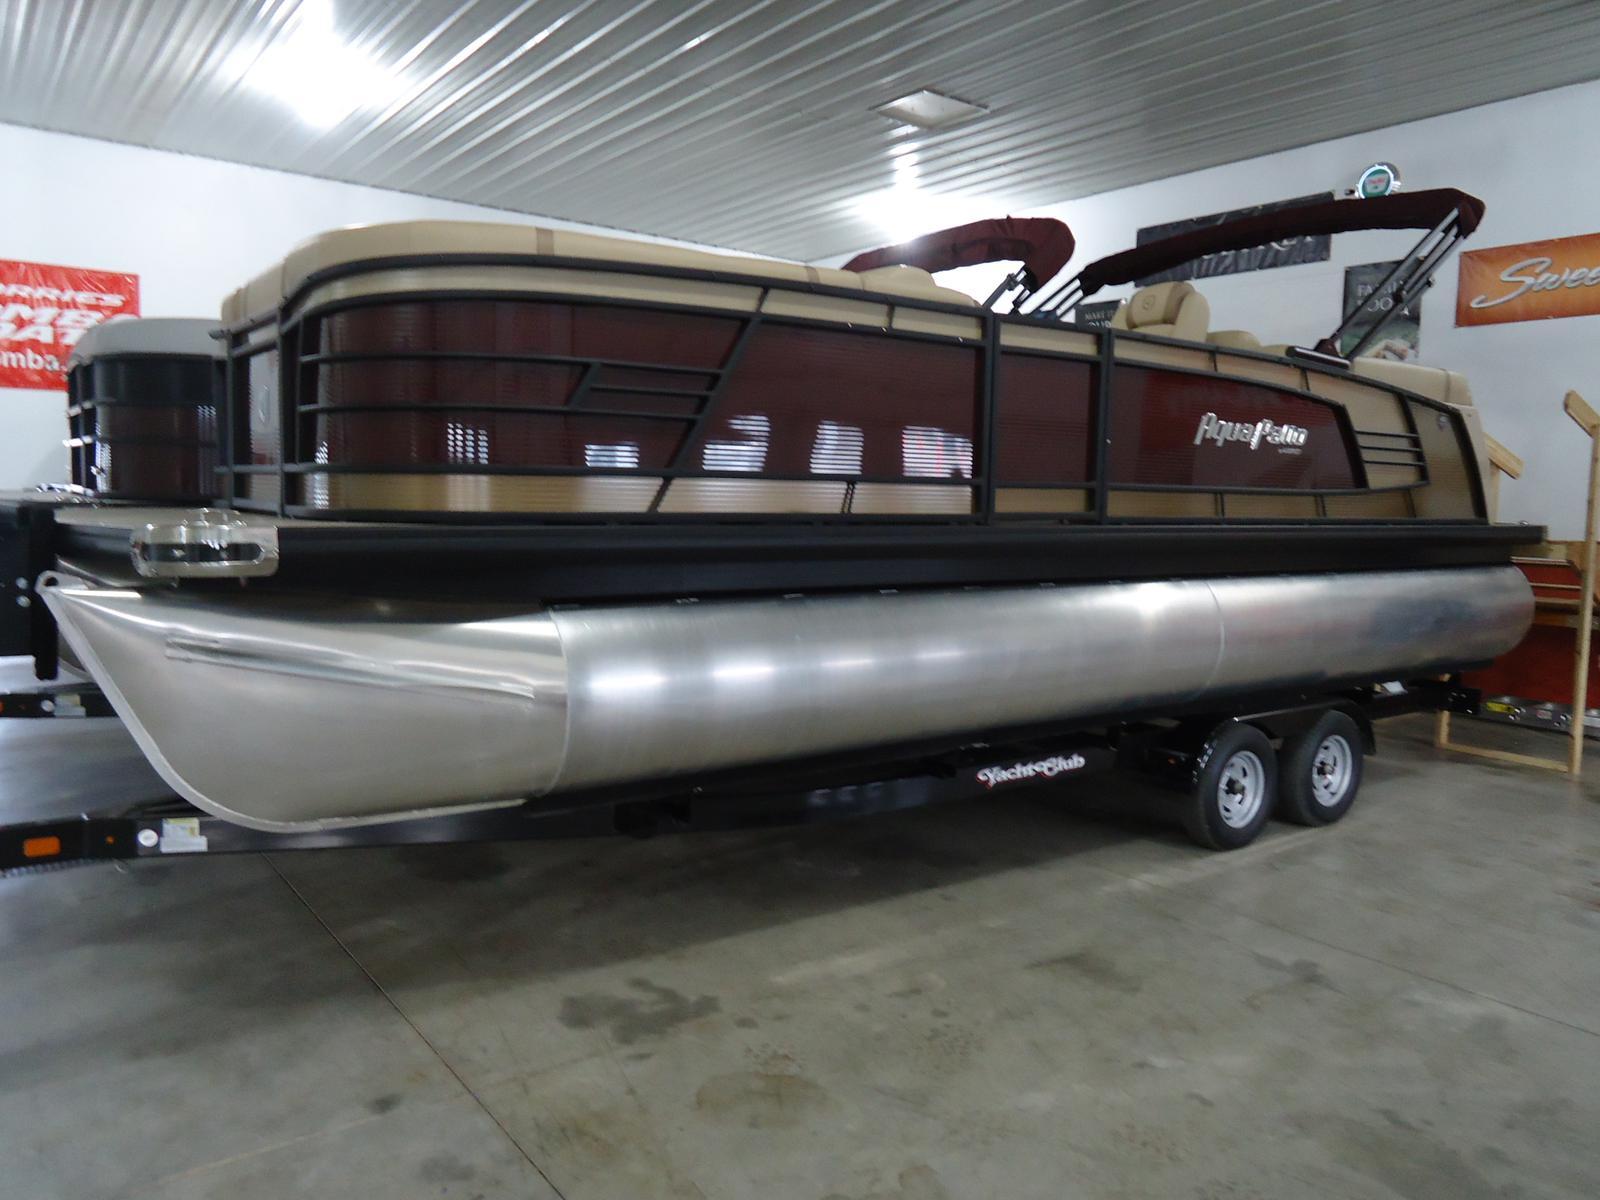 New 2018 Aqua Patio Ap 255 Ul Panora Ia BoatTrader